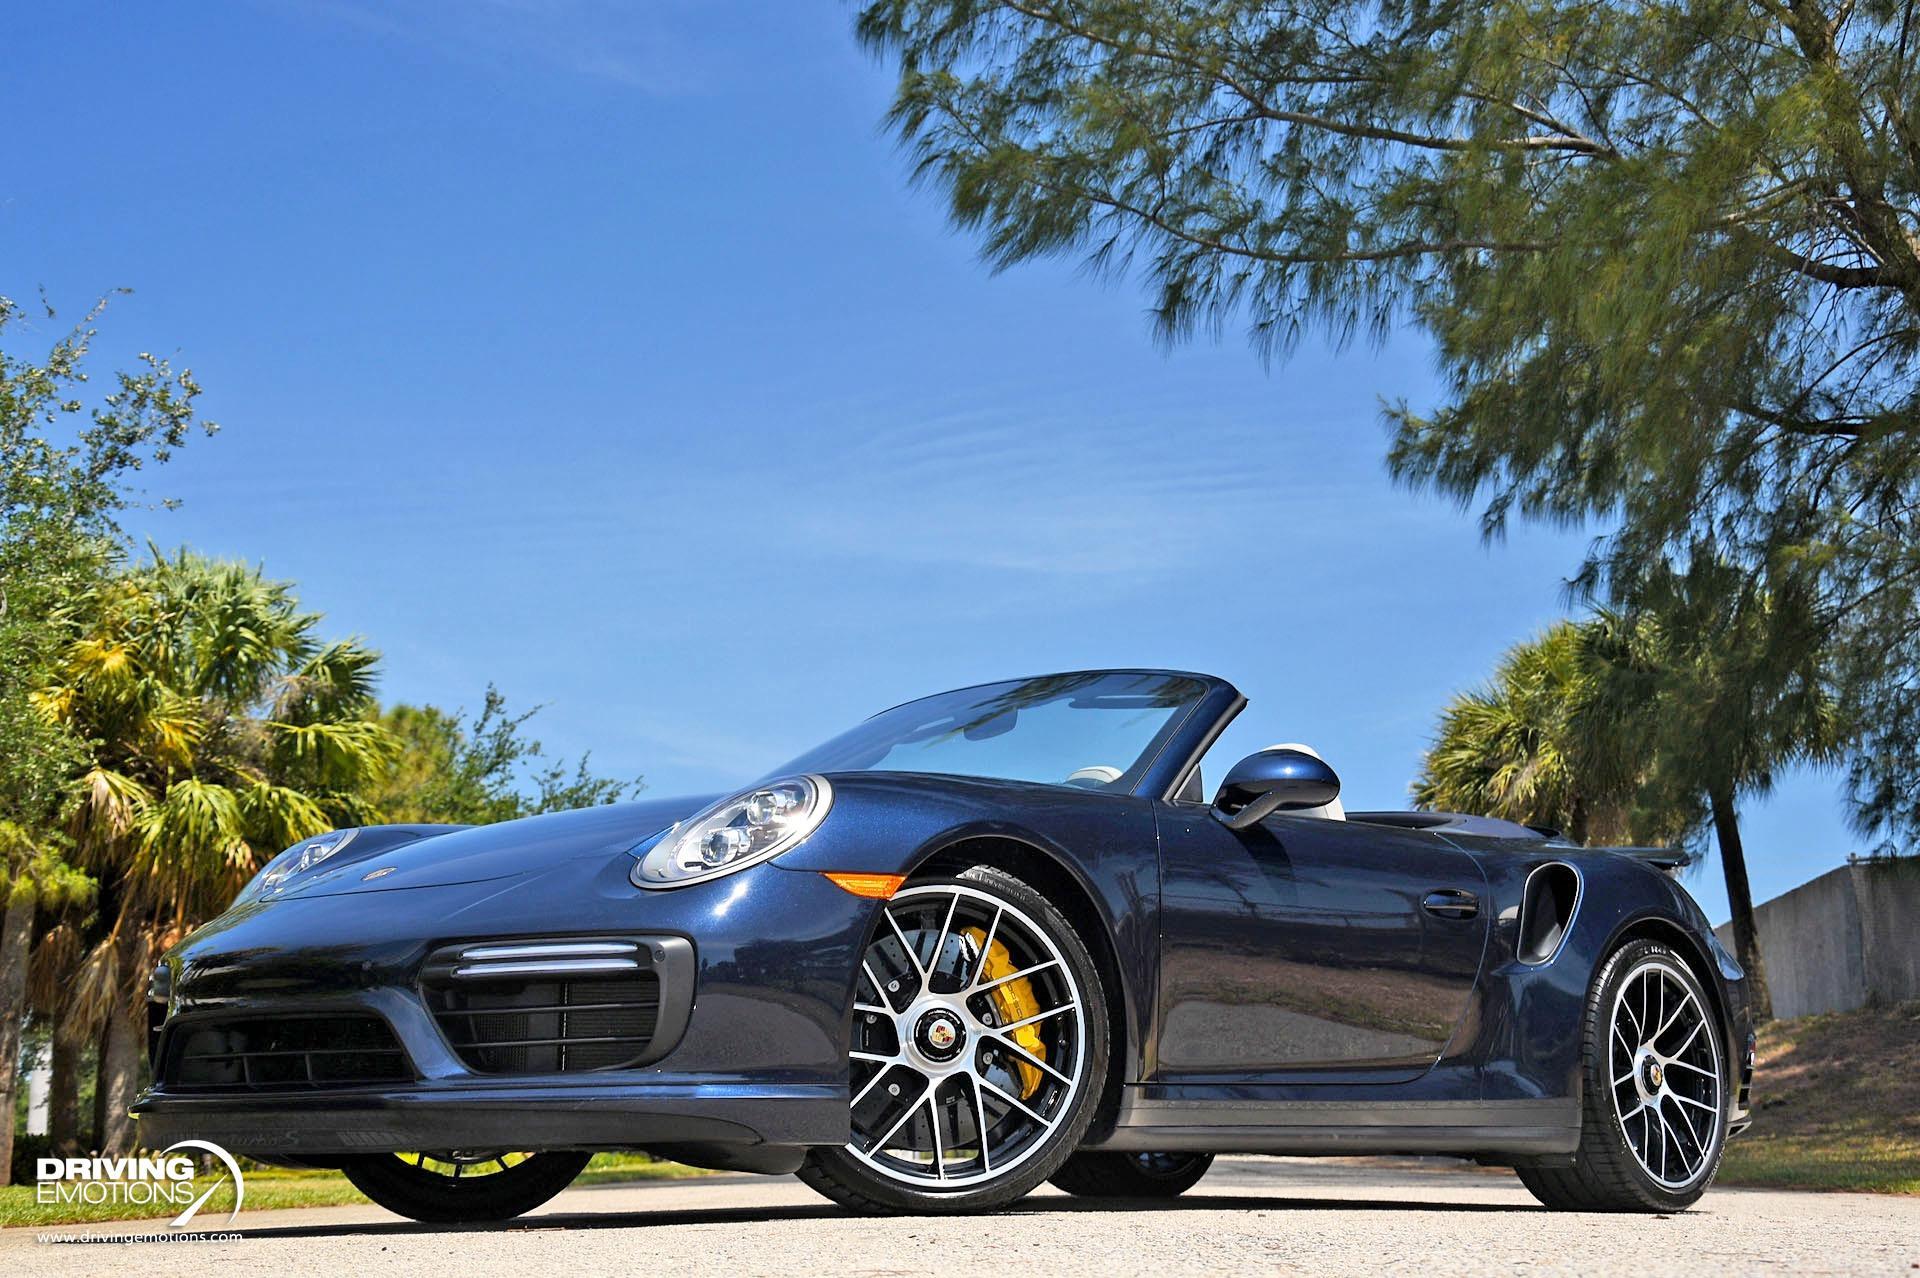 Used 2019 Porsche 911 Turbo S Cabriolet Turbo S Cabriolet   Lake Park, FL